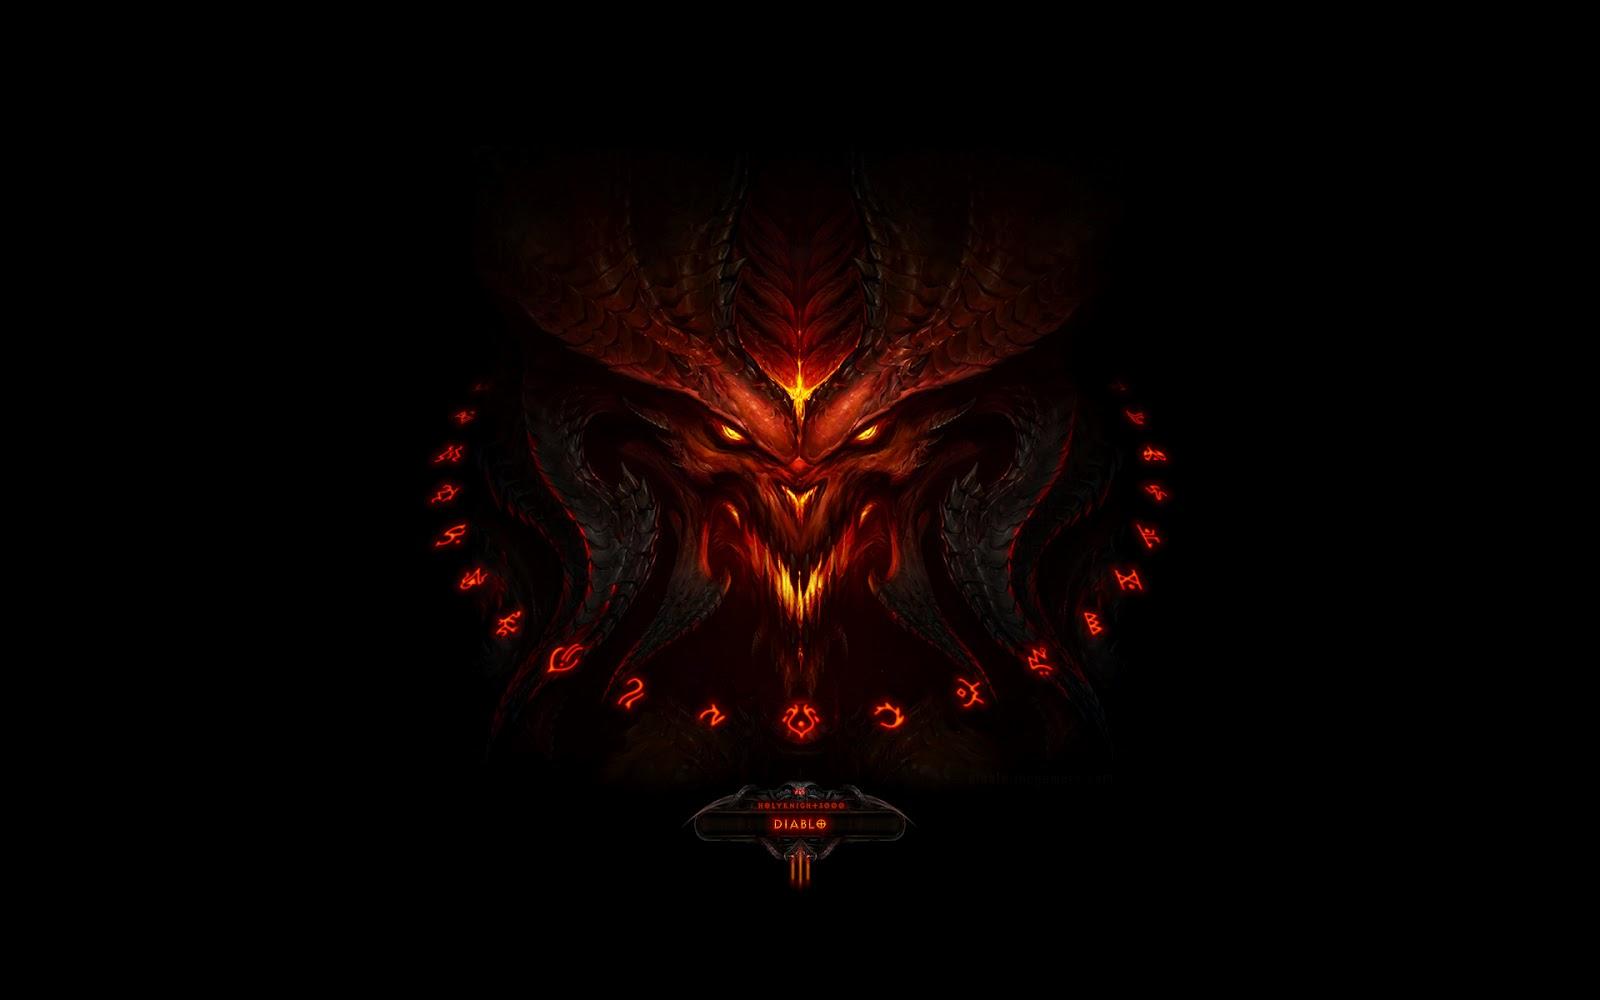 Free Download Diablo 3 Wallpapers In Full Hd 1080p Wallpaper